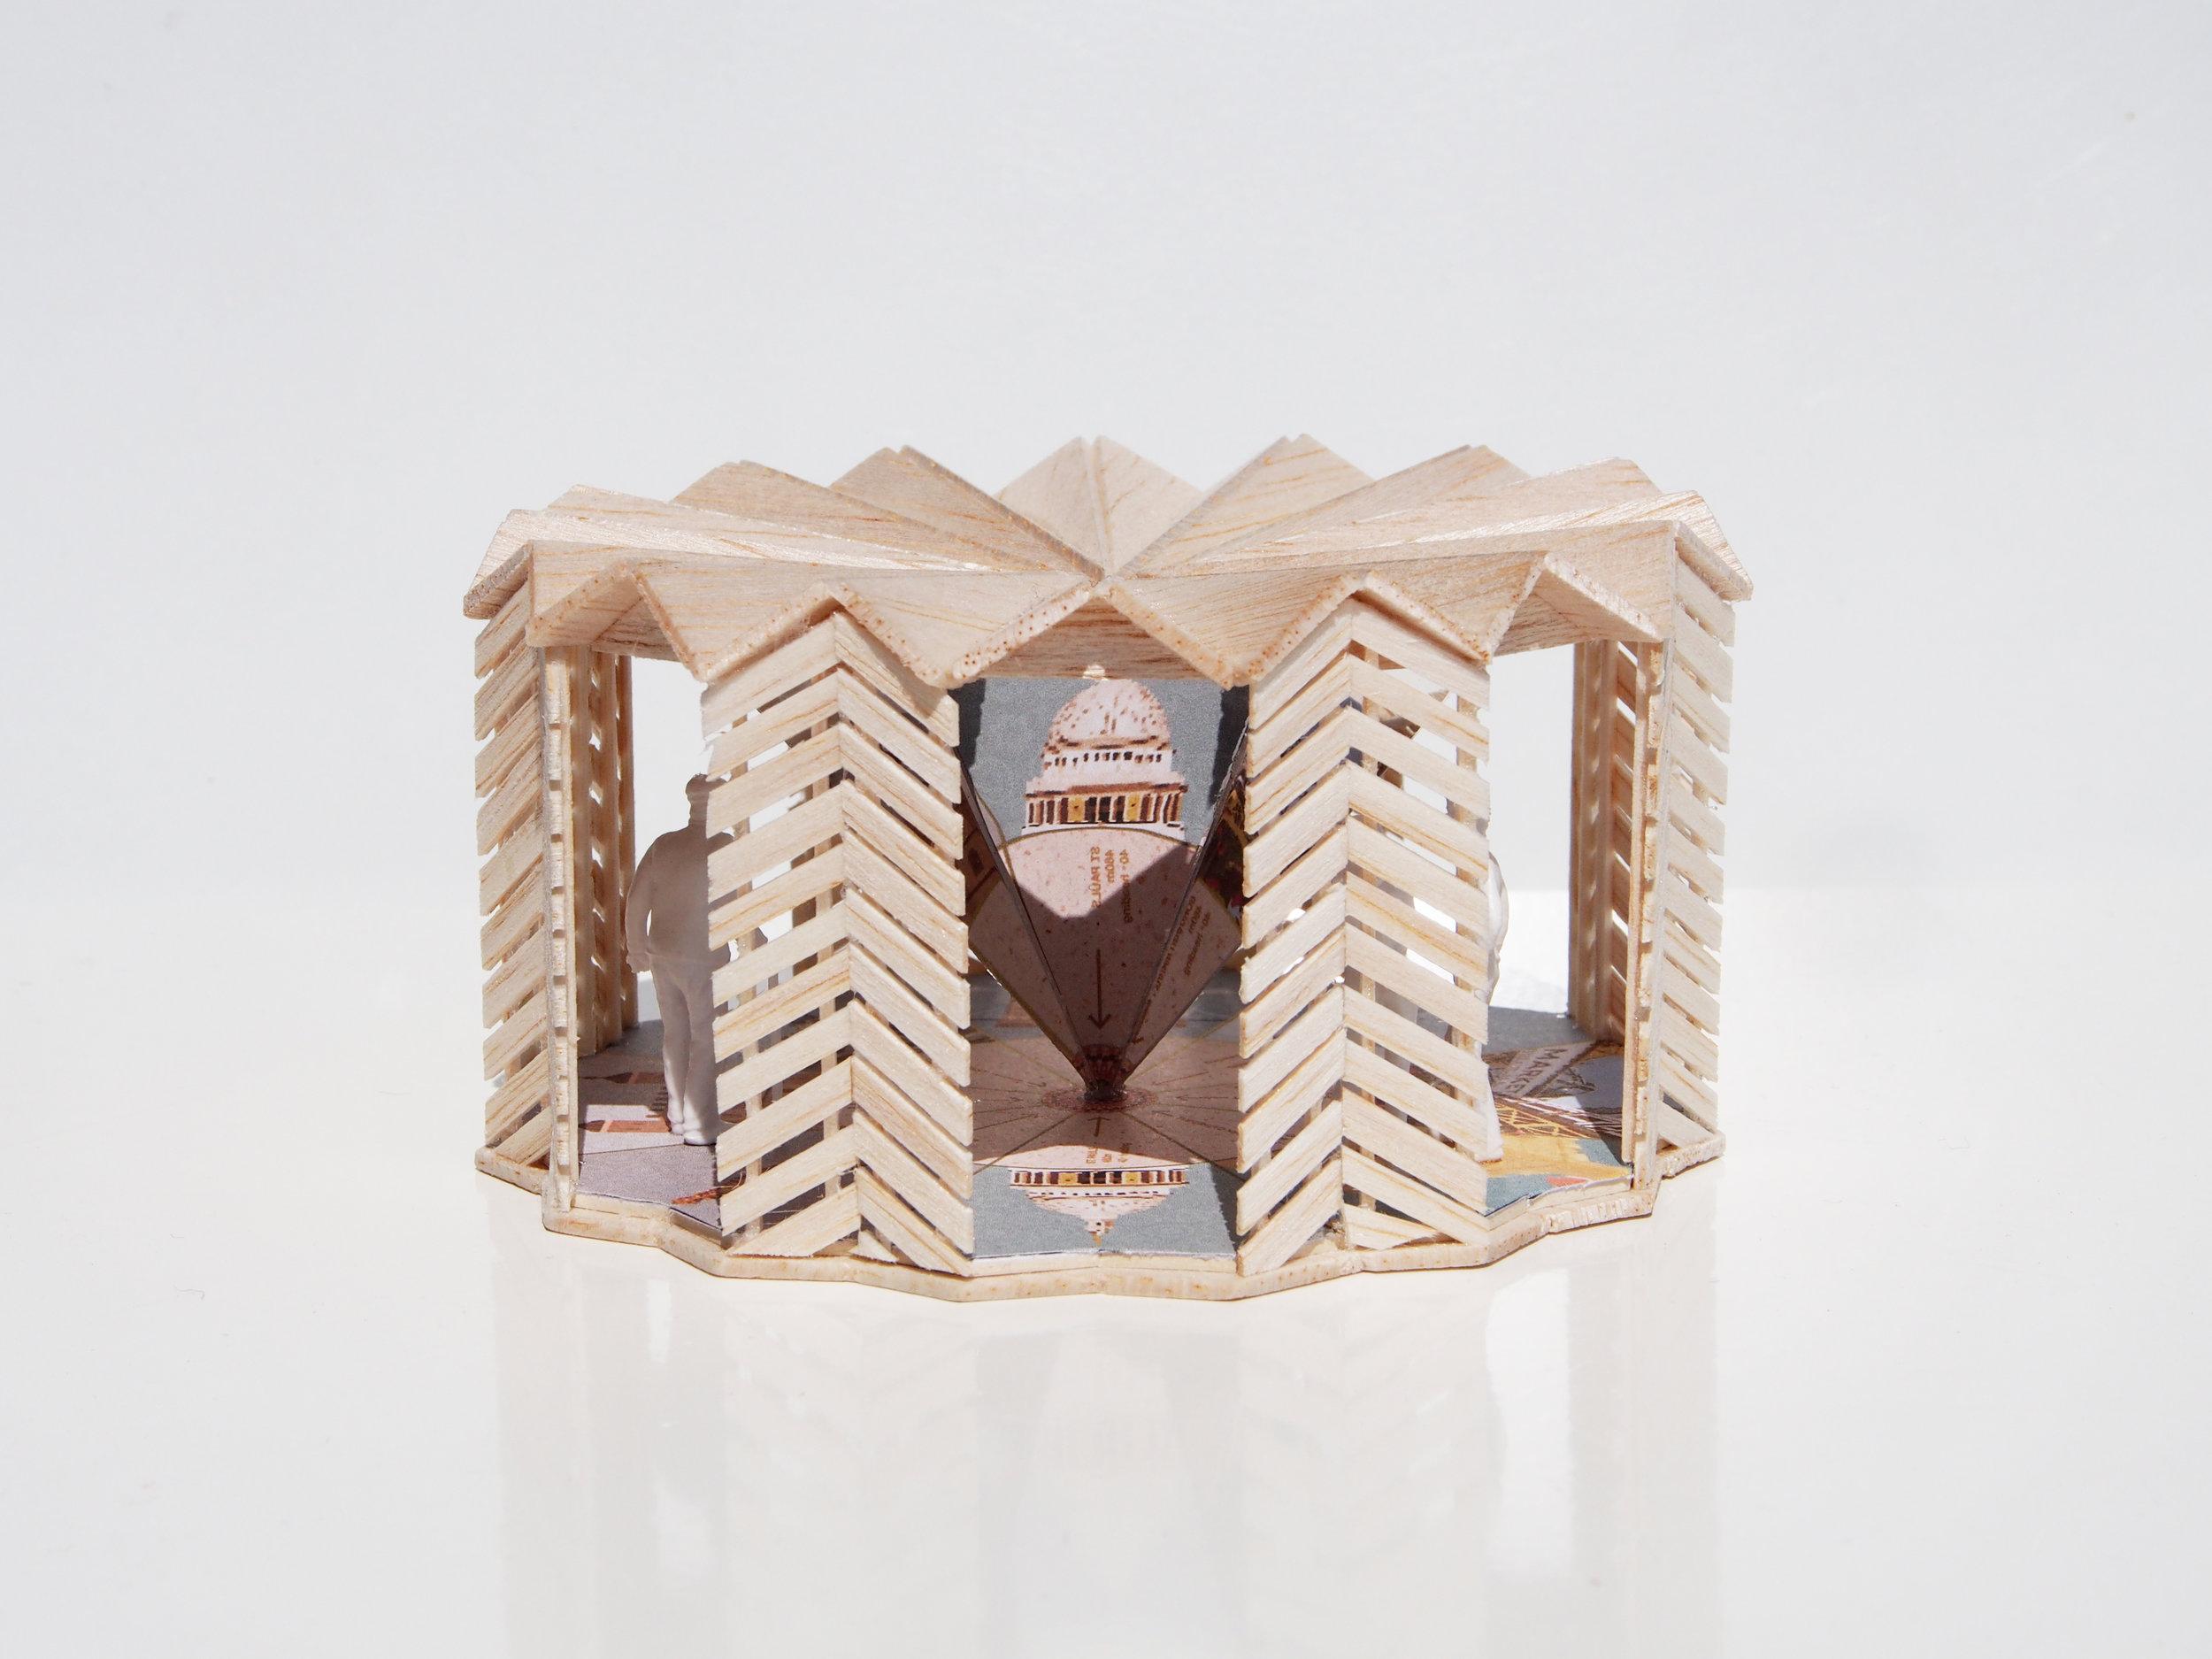 white-red-architects-london-zoetrope-pavilion-model-01.JPG